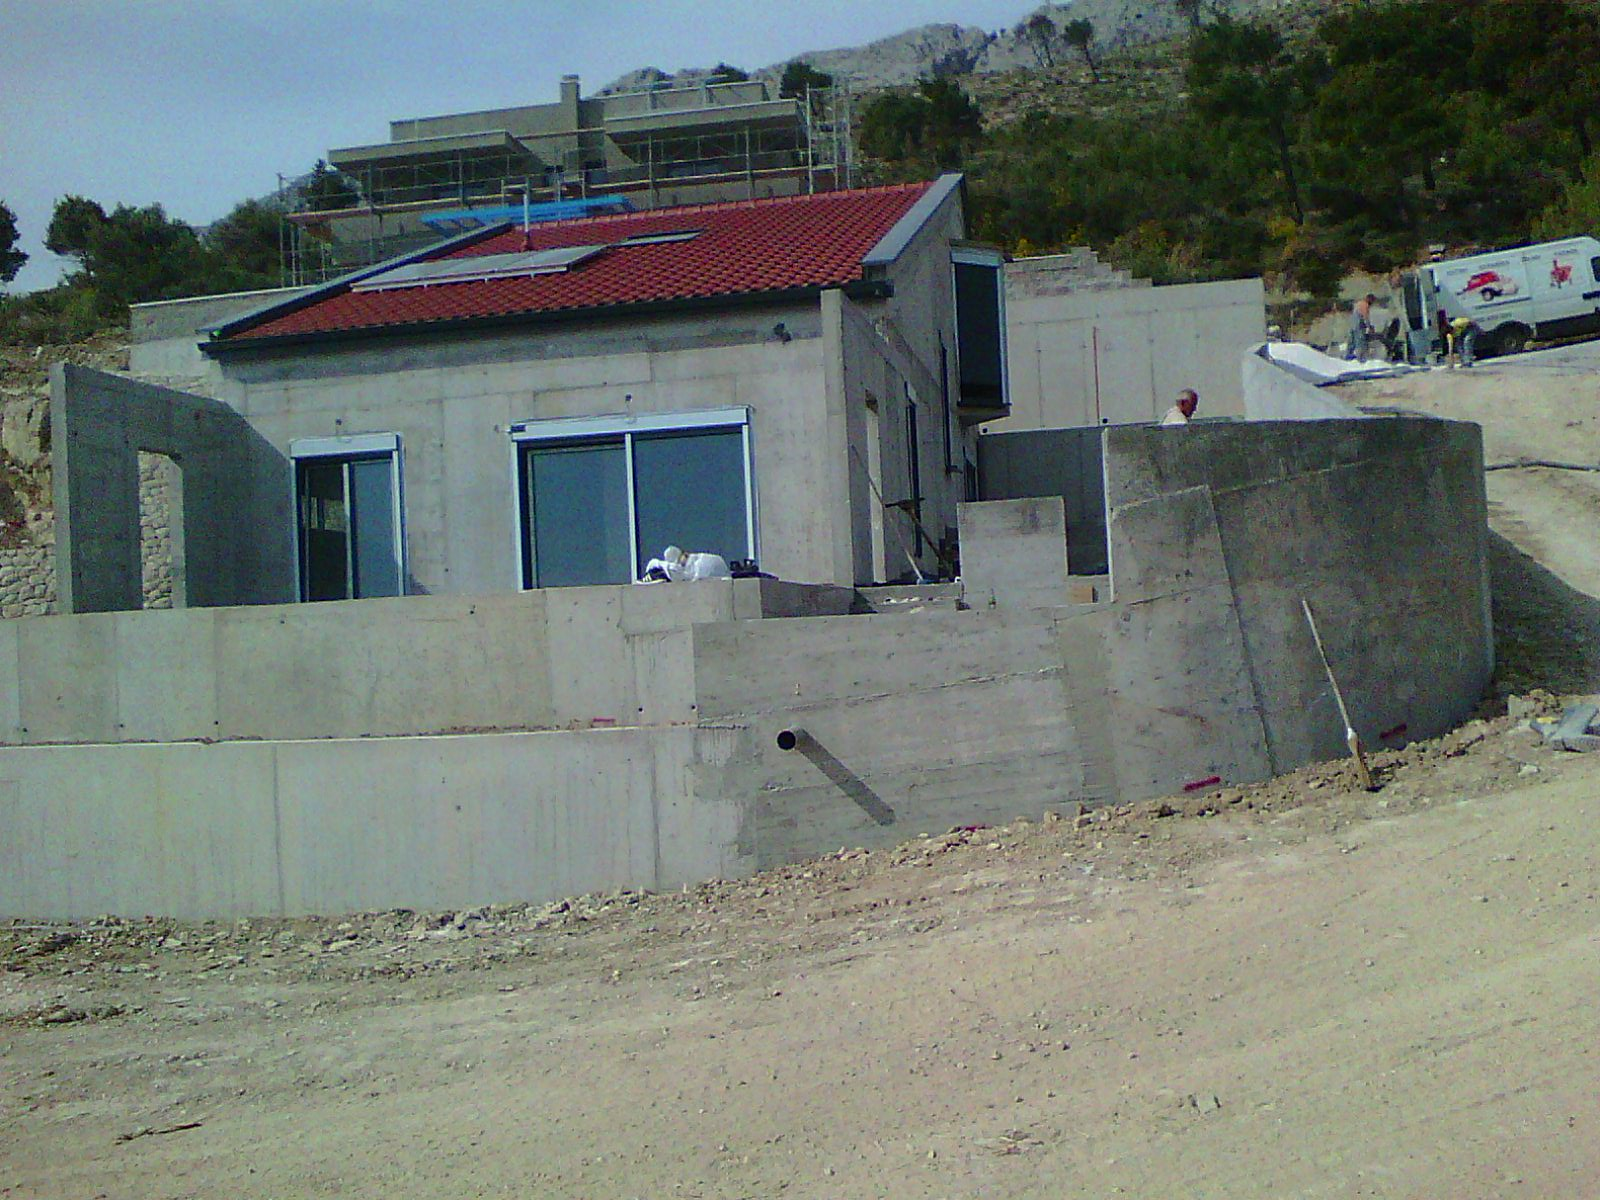 Izgradnja vodospreme, dovodnog i odvodnog cjevovoda